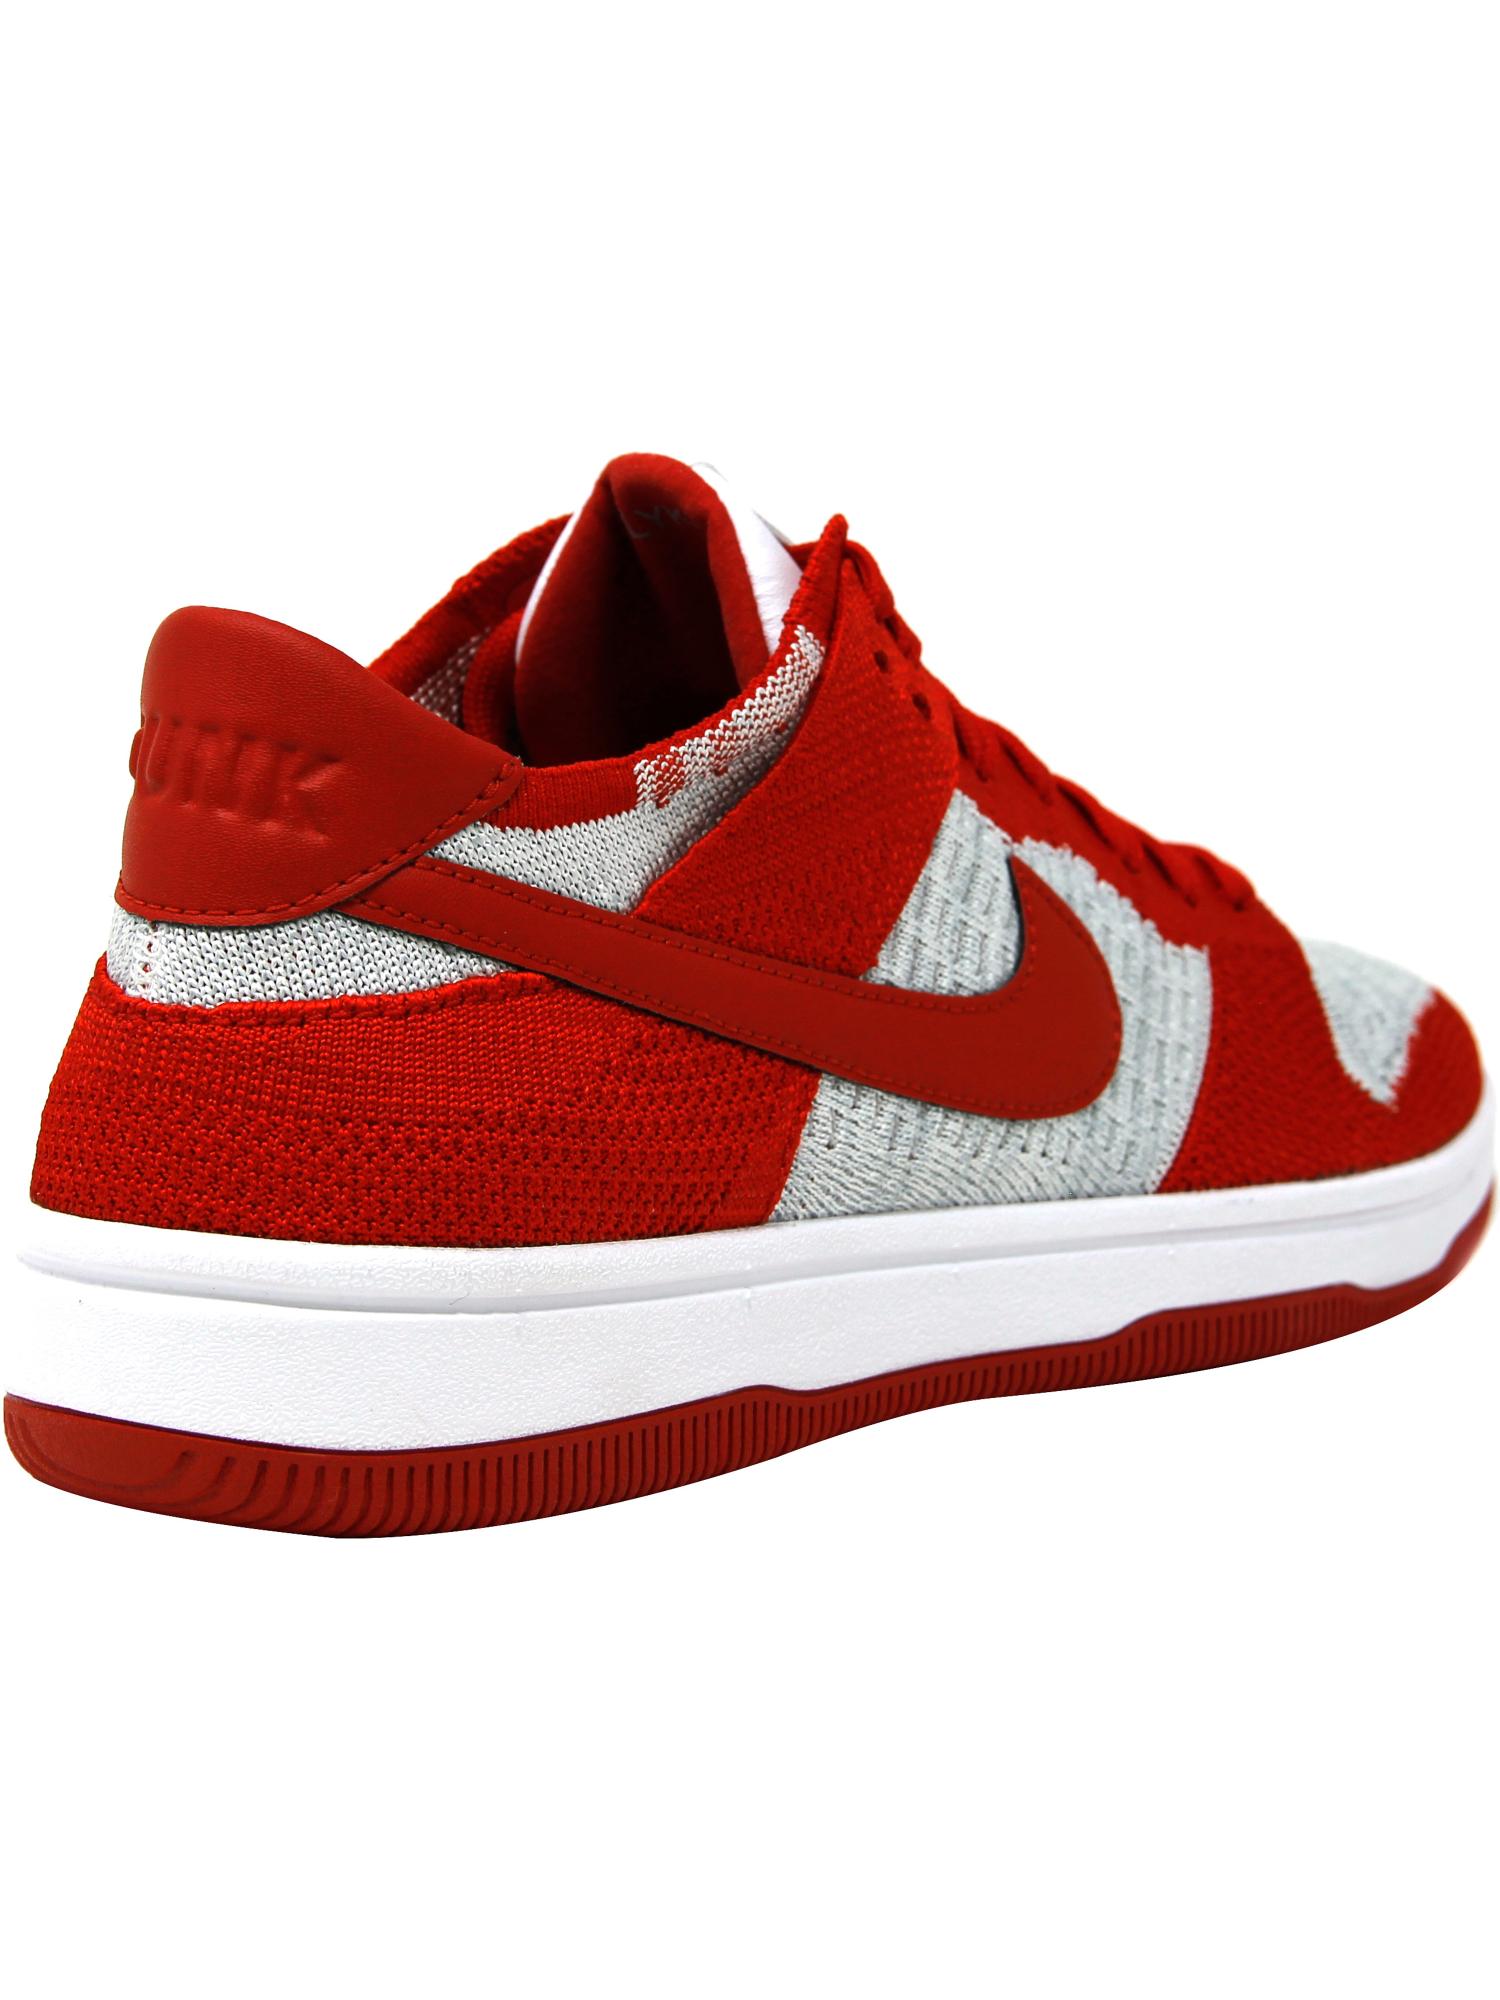 Nike-Men-039-s-Dunk-Flyknit-Ankle-High-Basketball-Shoe